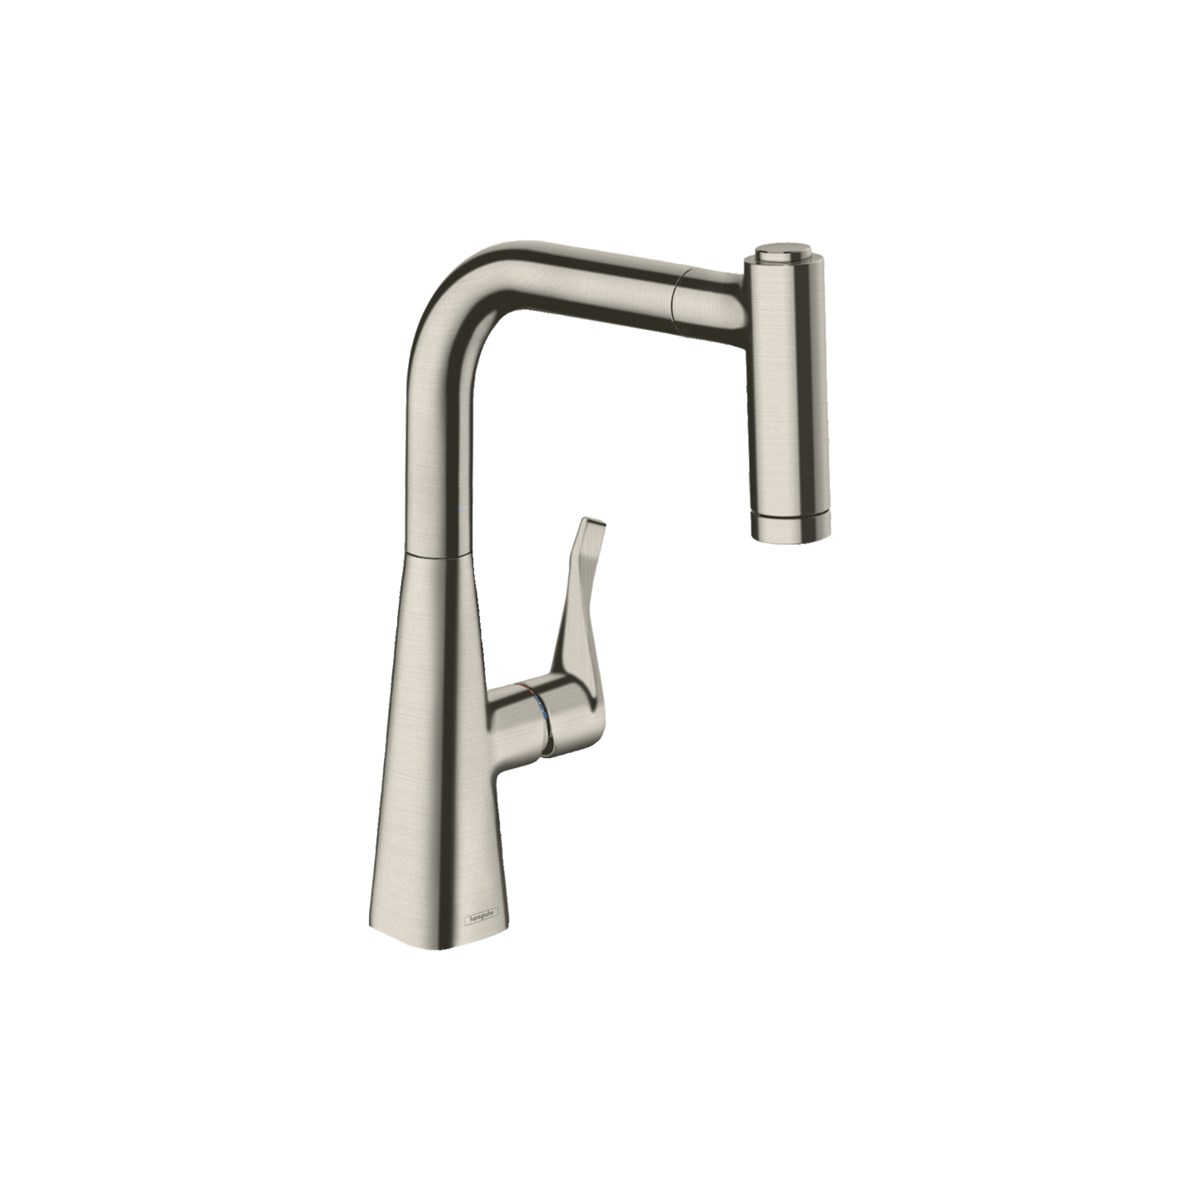 Hansgrohe-Metris-M71-Kitchen-Mixer-220-14834800-Matisse-1